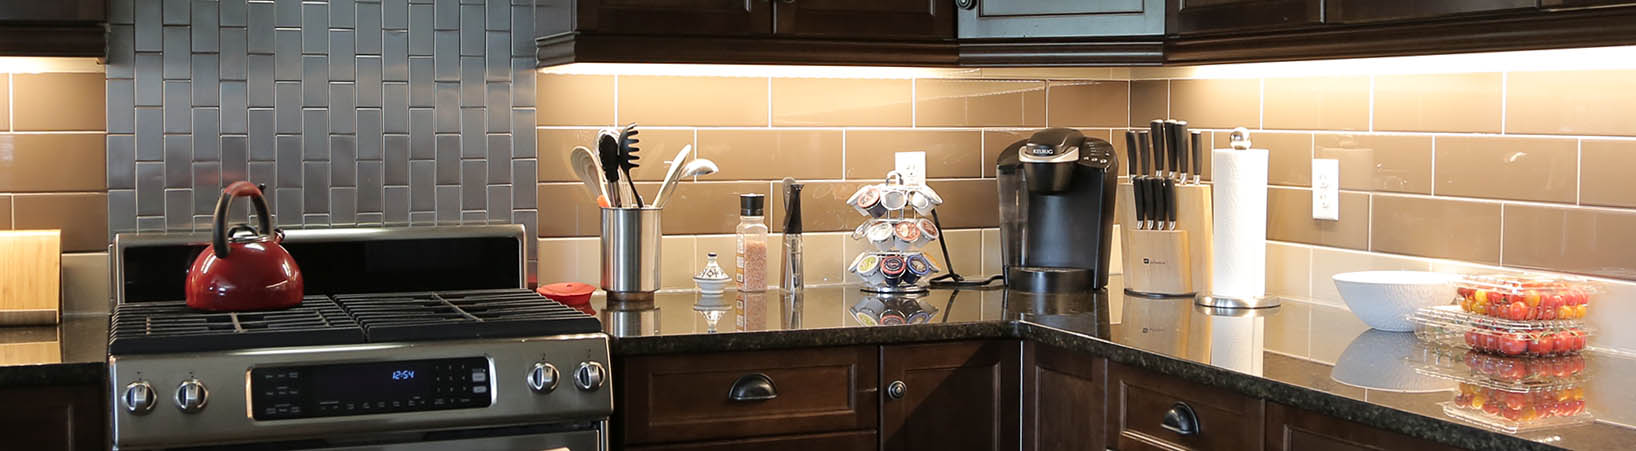 kitchen-lighting2